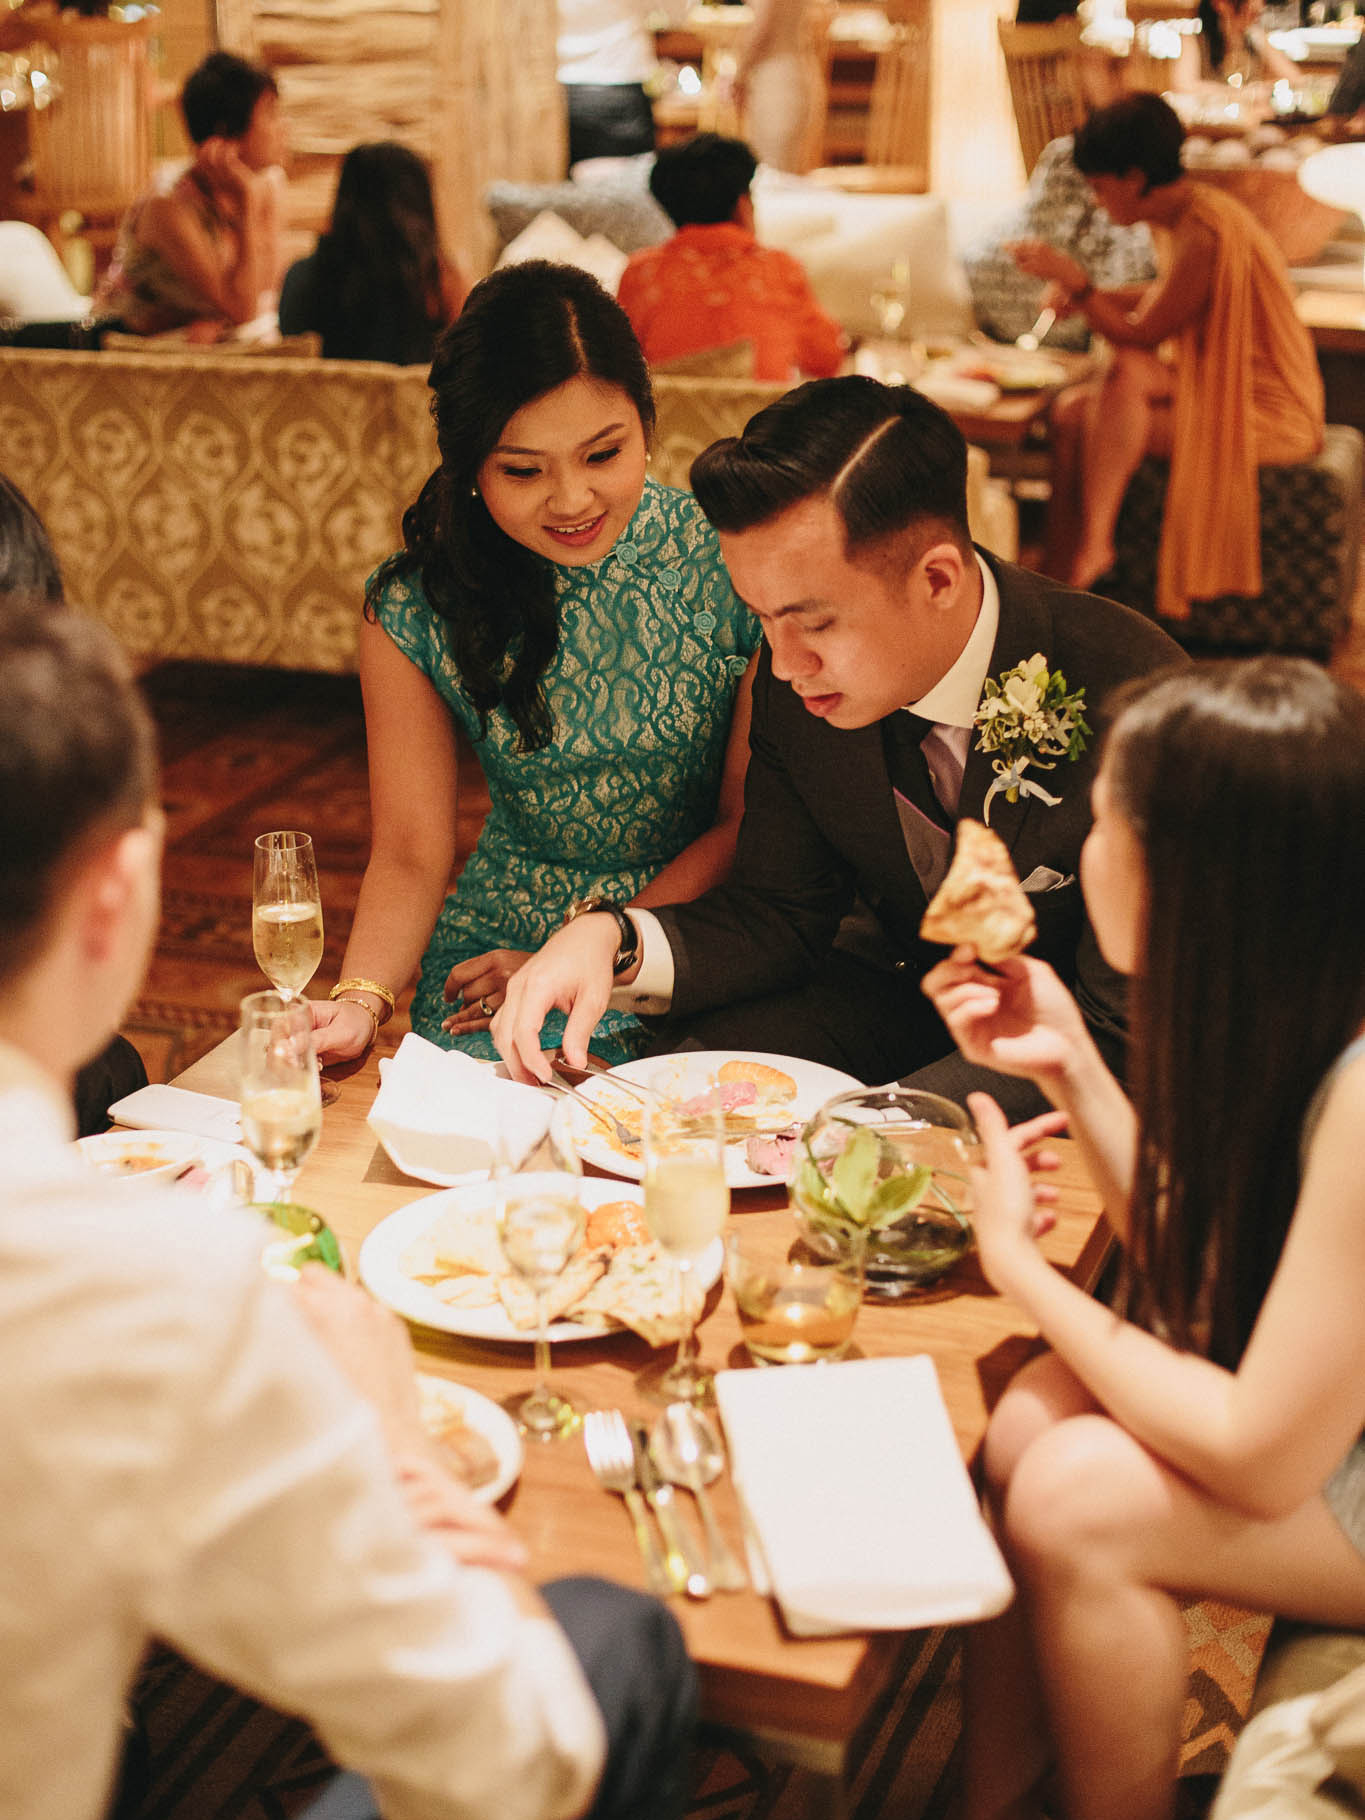 singapore-wedding-photographer-malay-indian-pre-wedding-travel-wmt-2015-jeremy-larissa-68.jpg